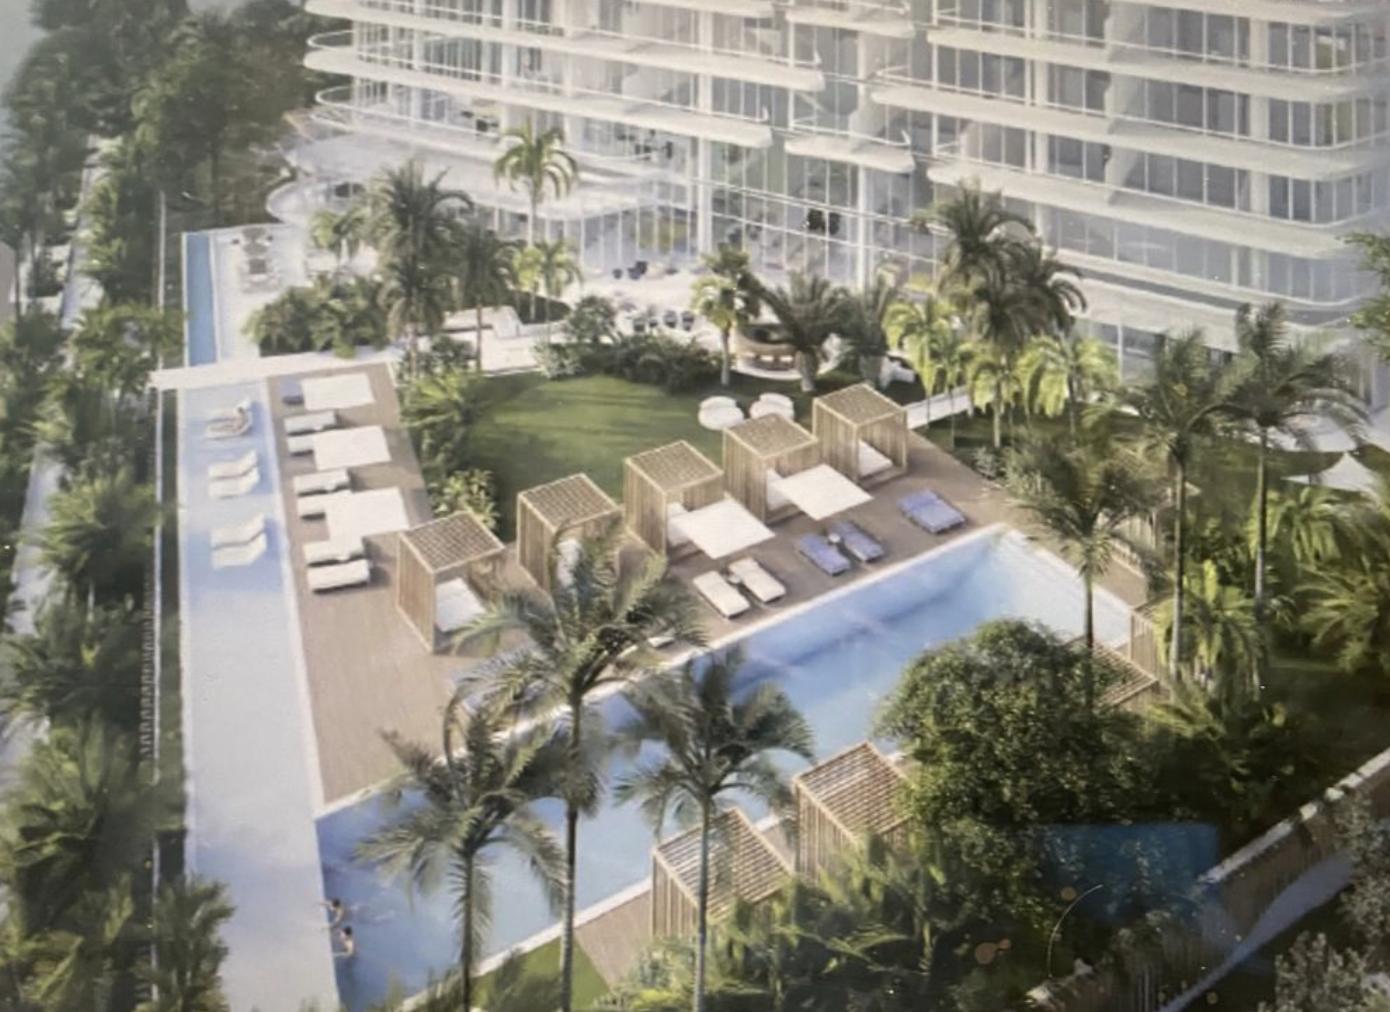 Introducing the The Ritz Carlton Residences Pompano Beach